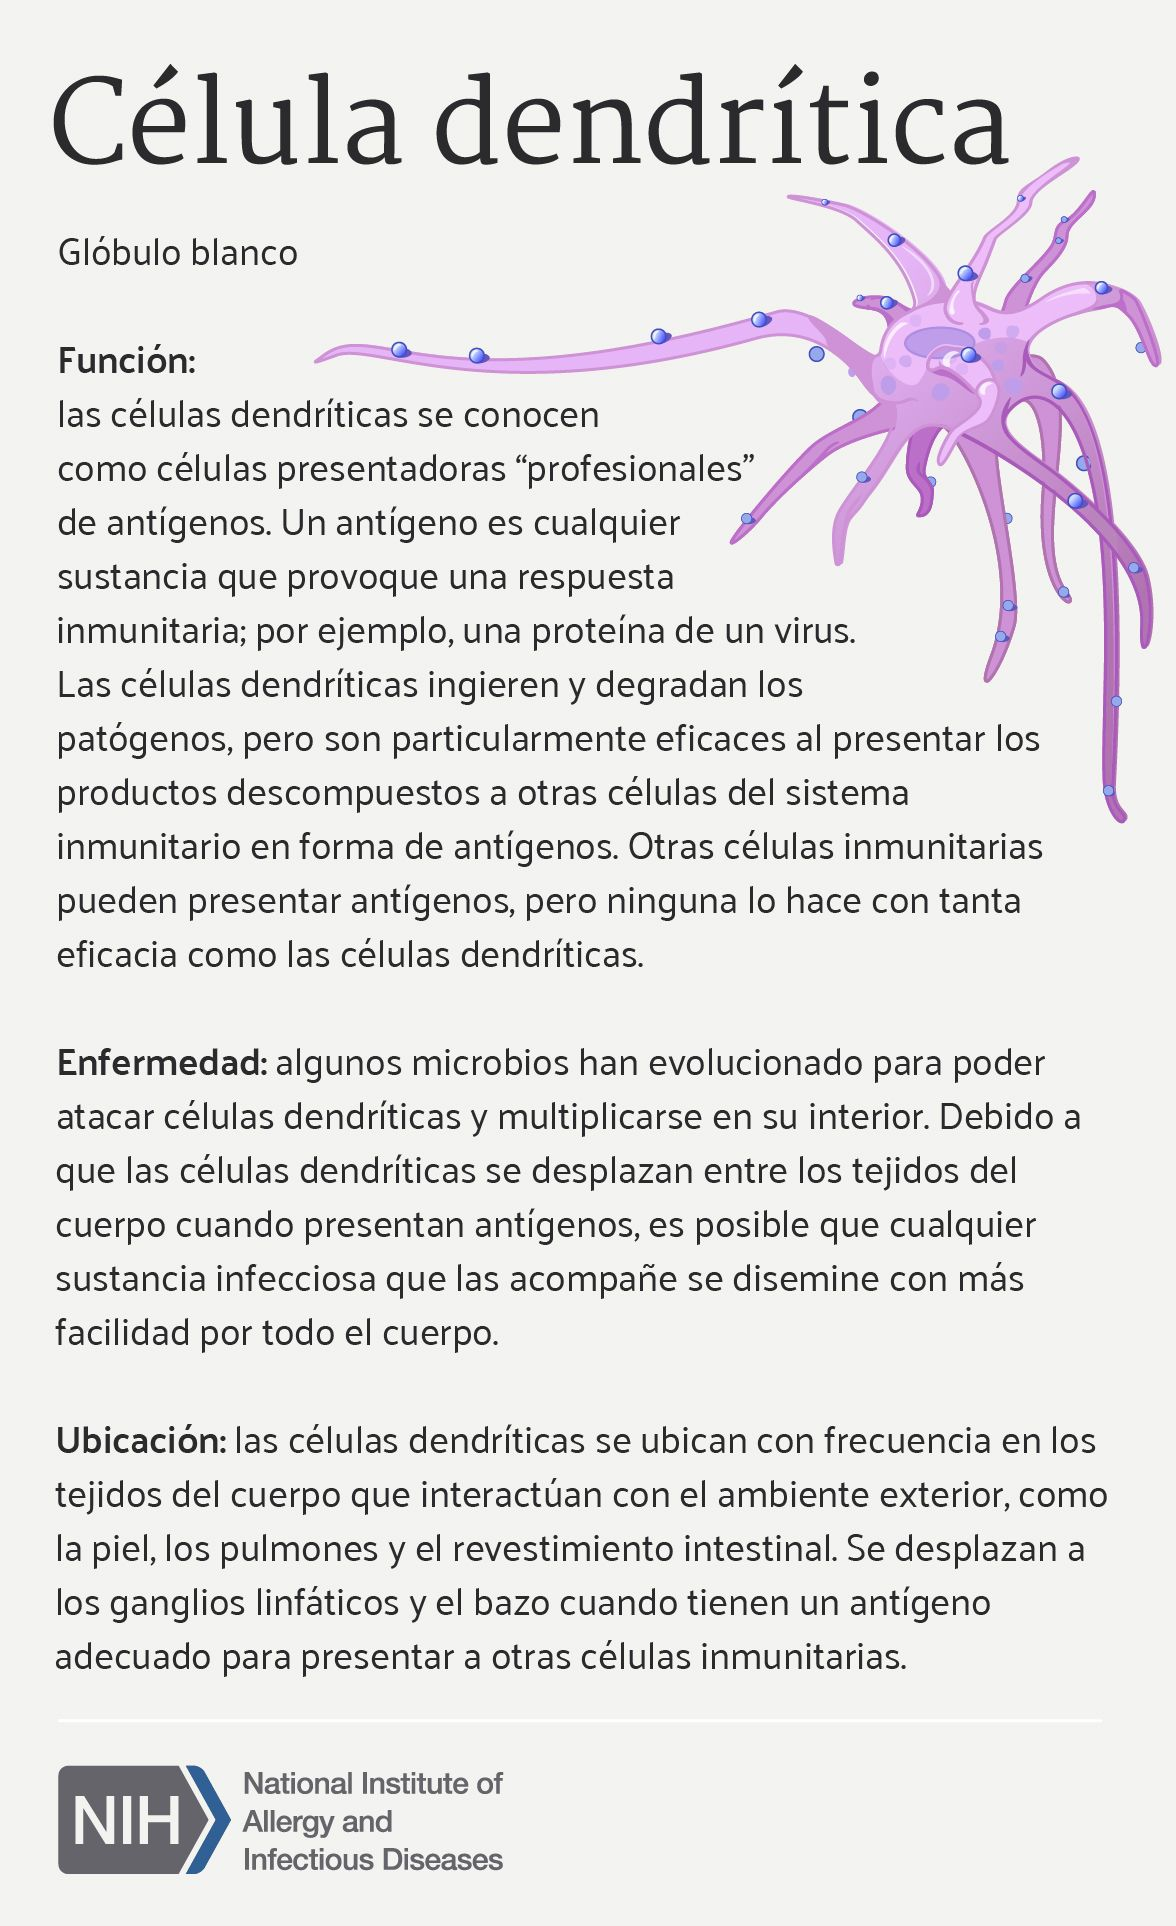 Célula Dendrítica (Dendritic Cell) | Science and nature | Pinterest ...